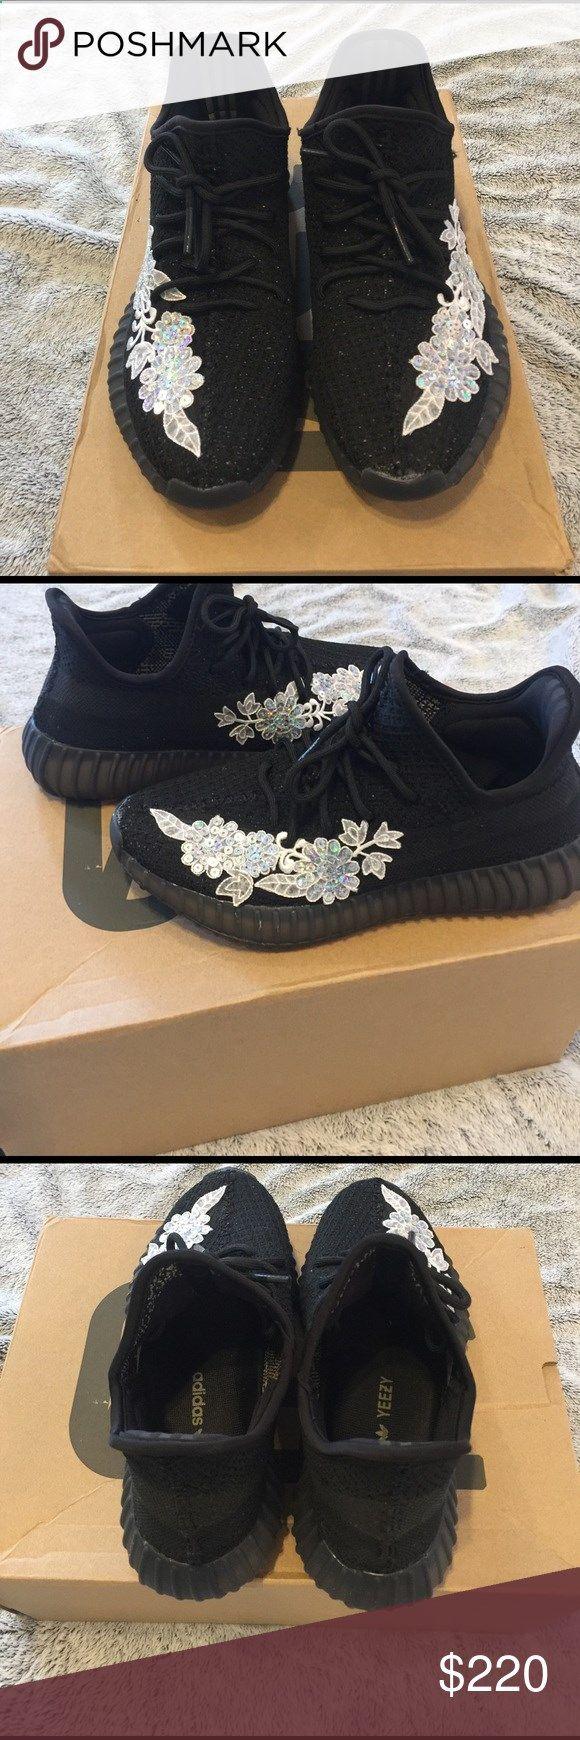 adidas yeezy 750 boost black worn out kimono adidas shoes women running